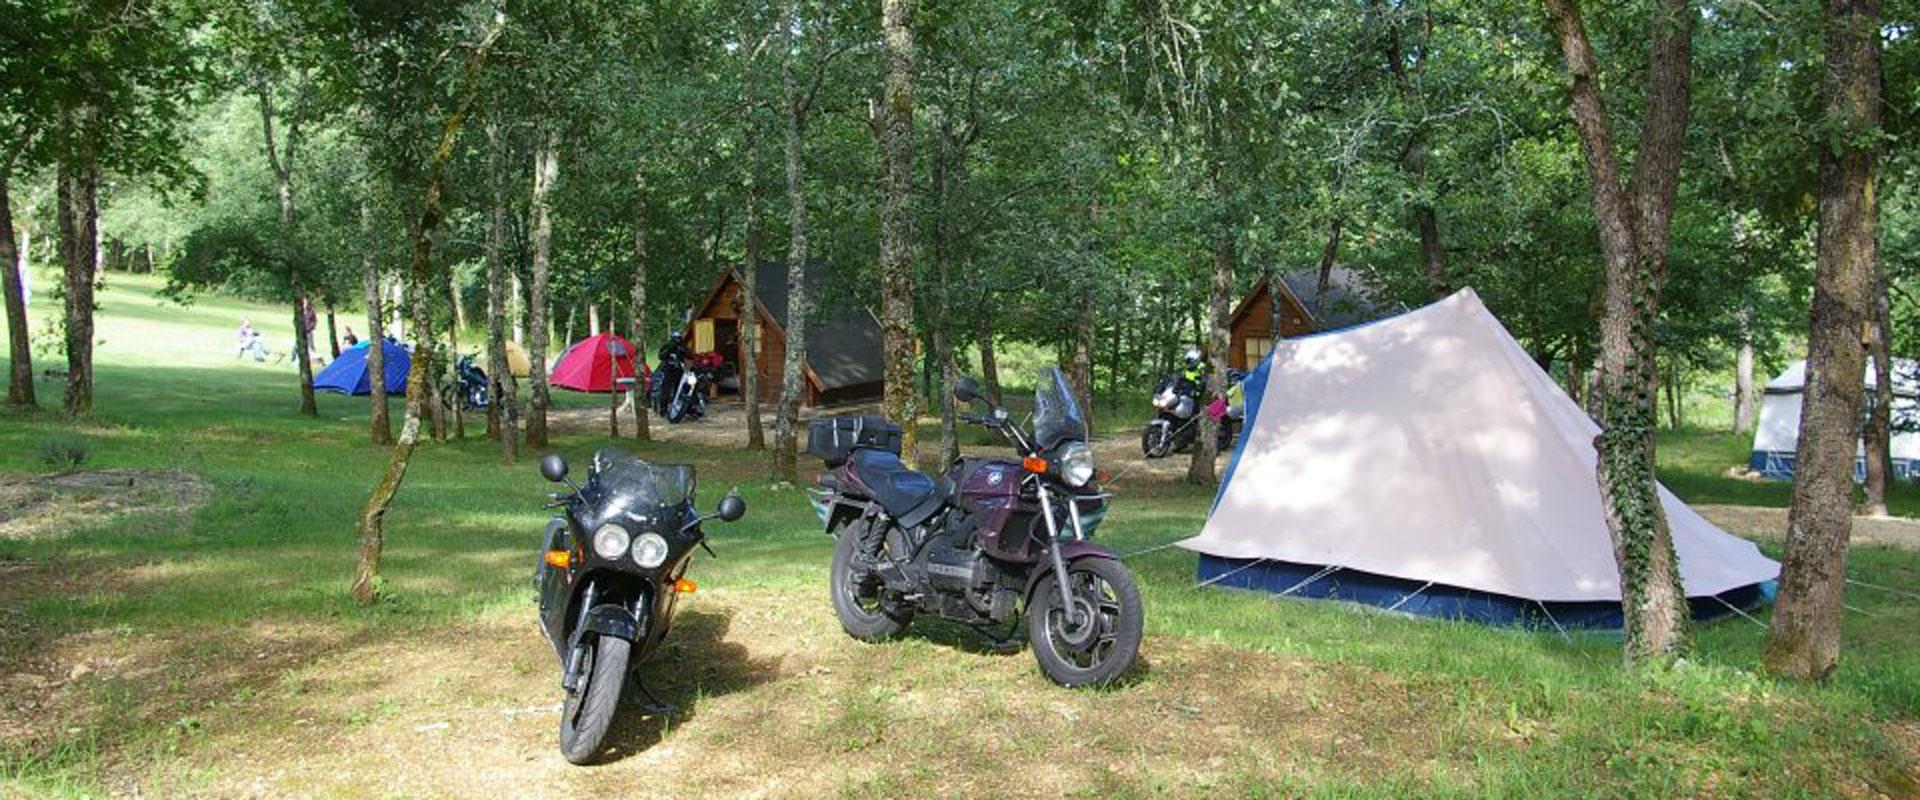 Camping Moto Dordogne